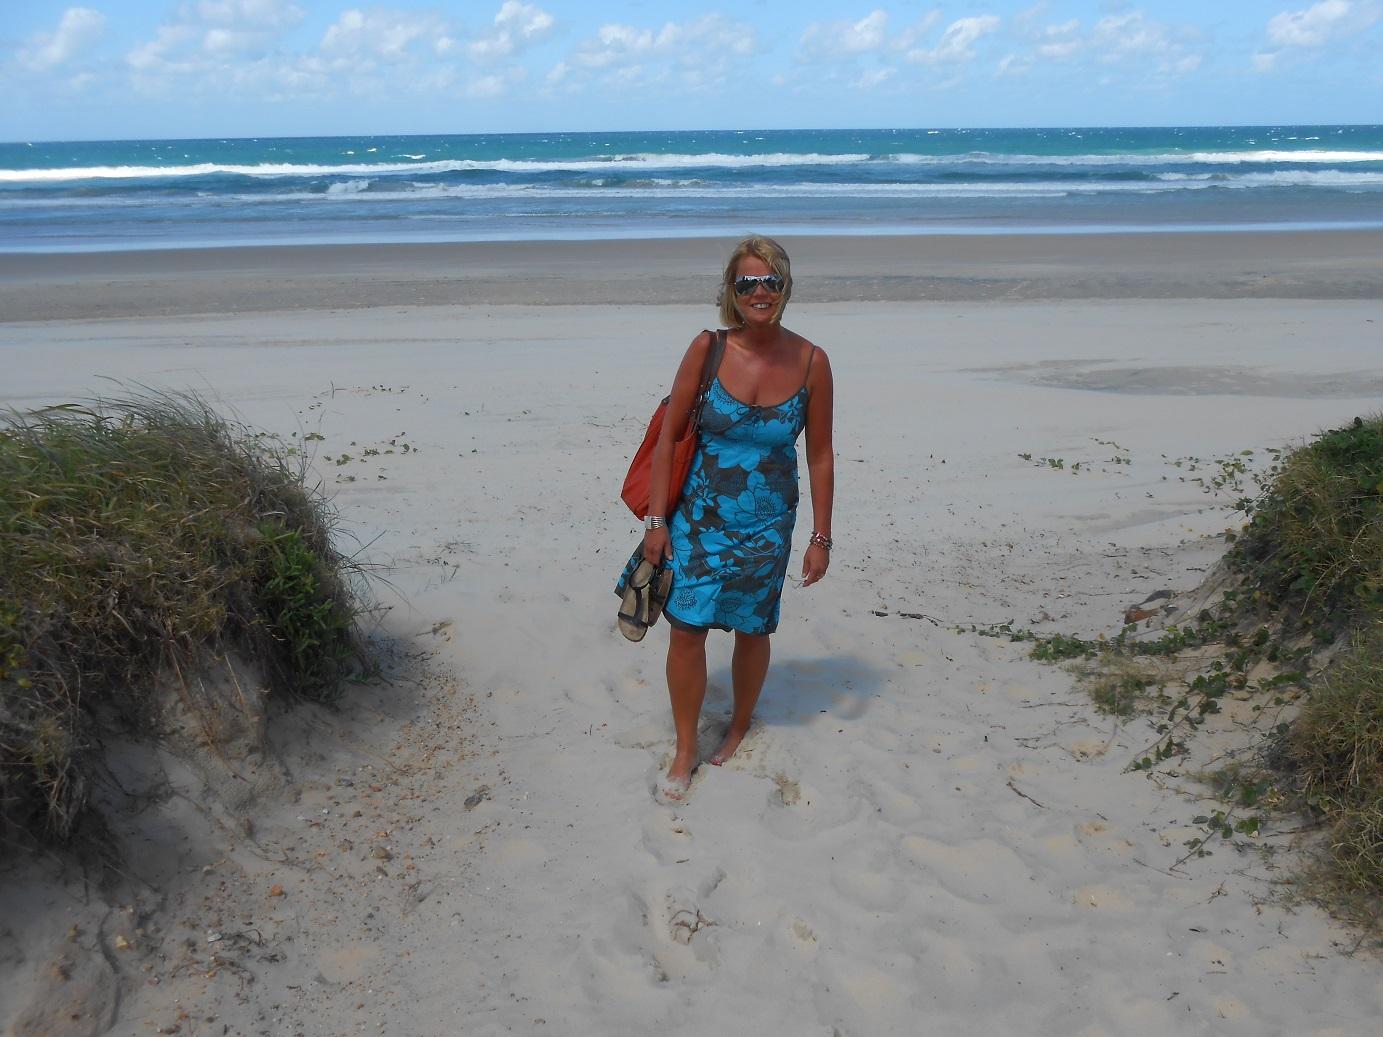 Beach 002 - Copy